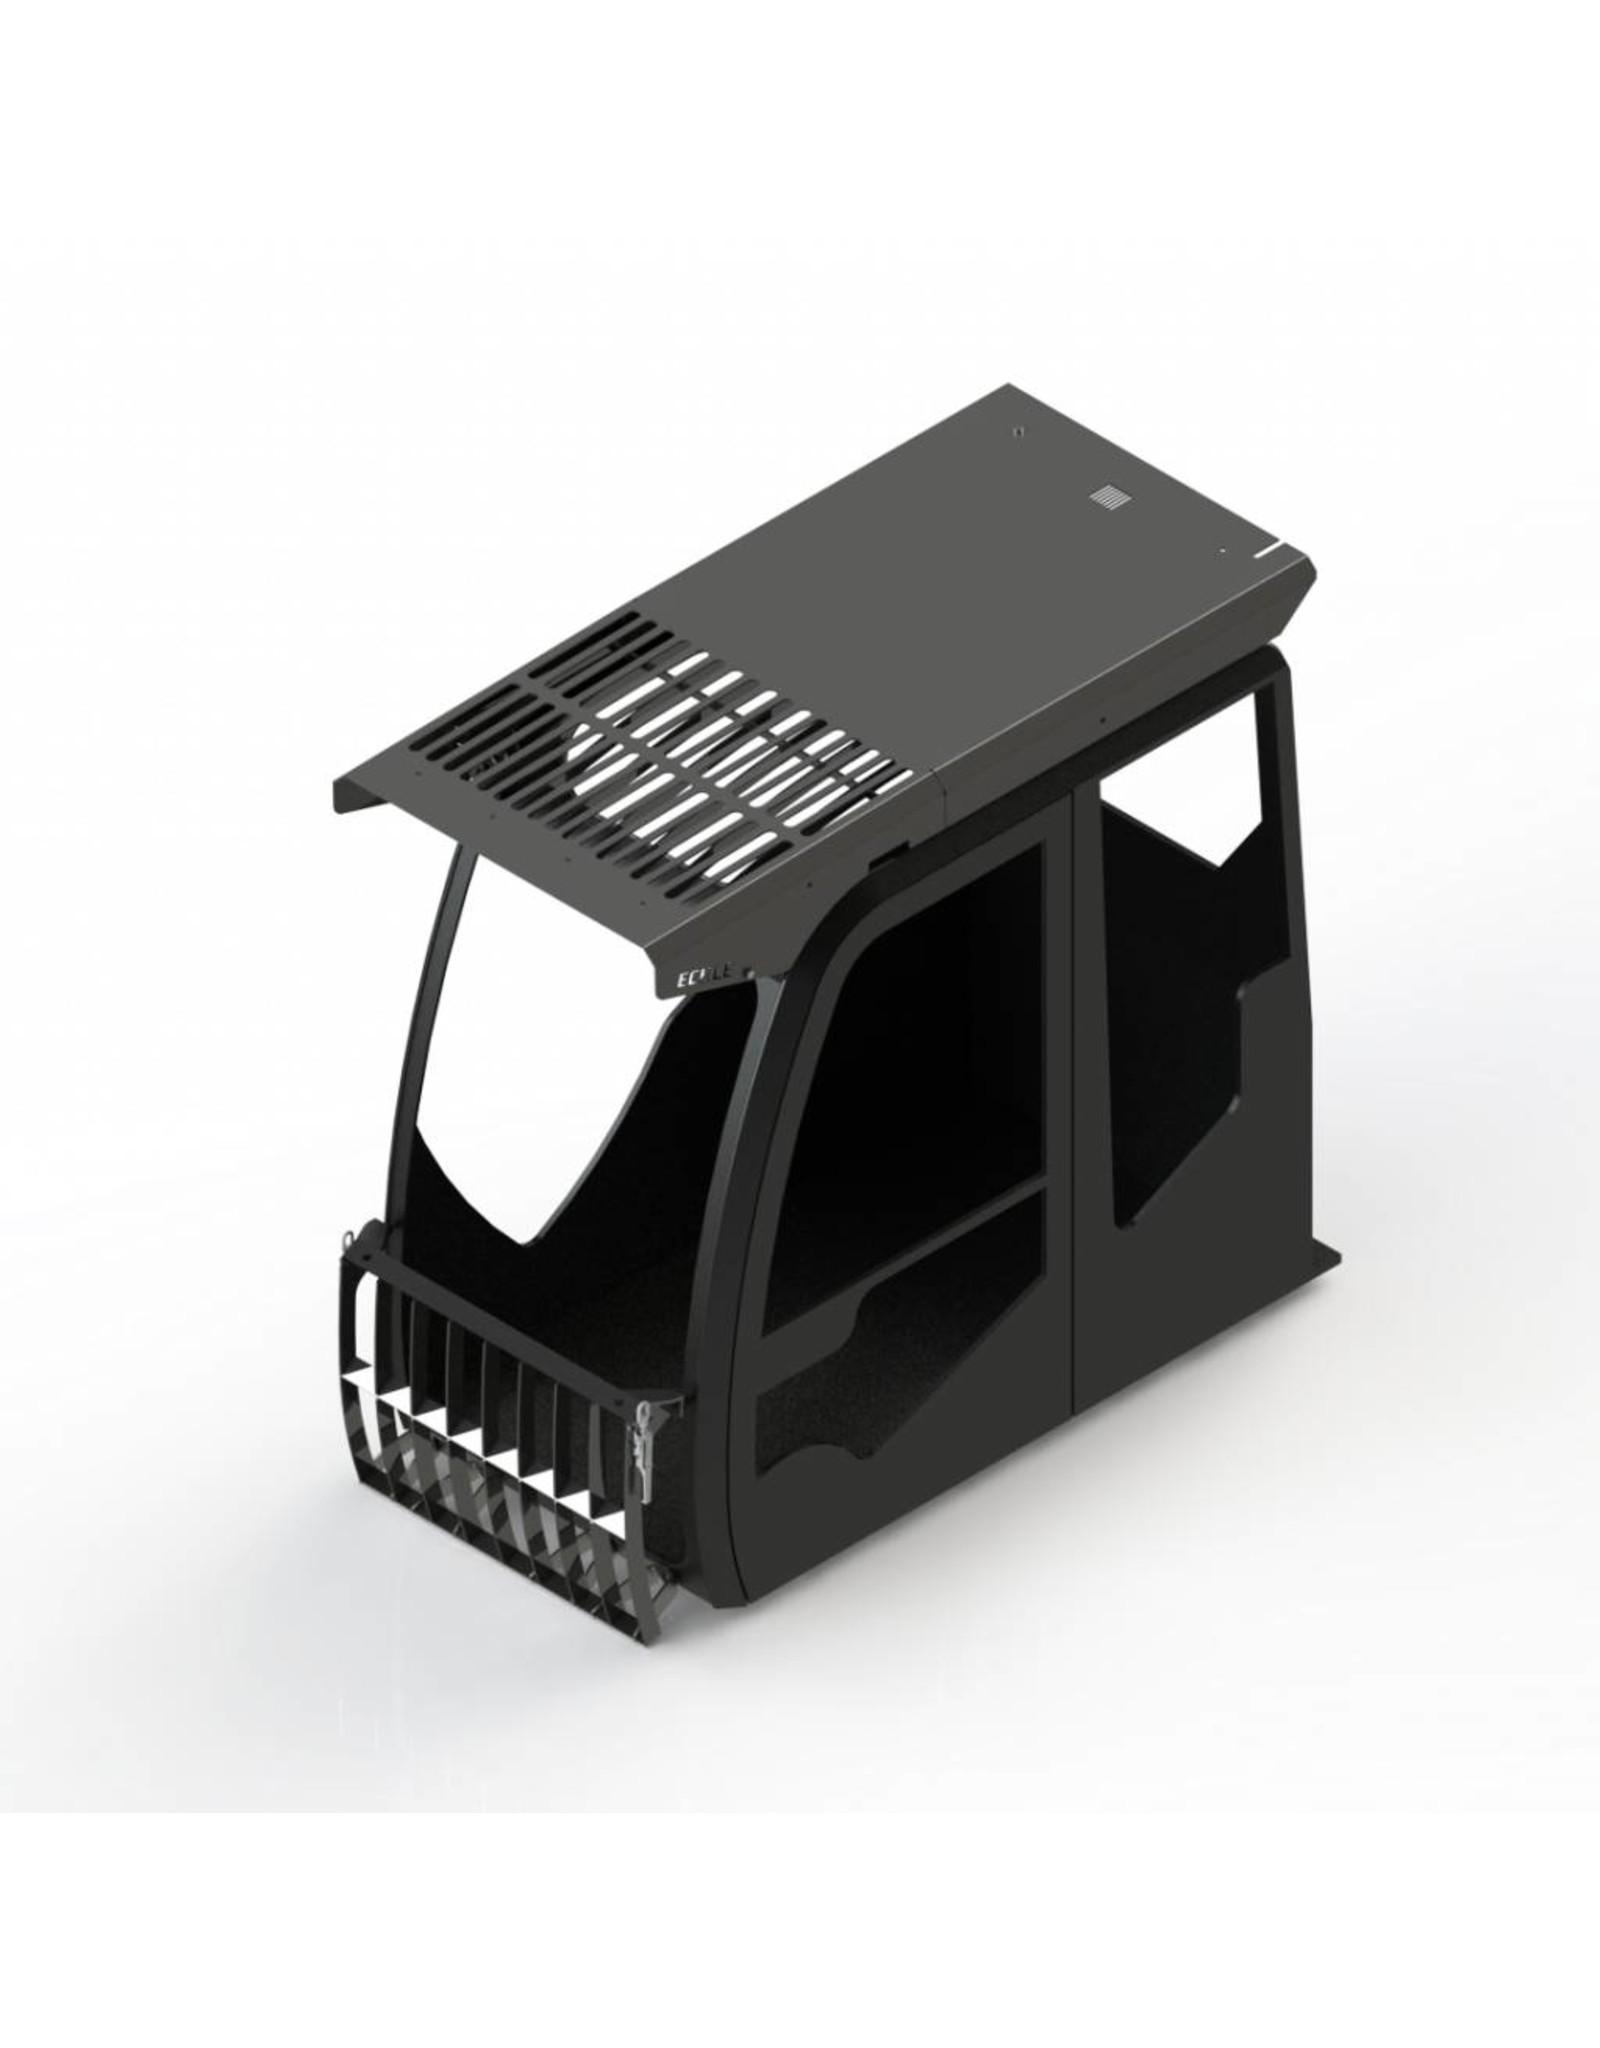 Echle Hartstahl GmbH FOPS für Doosan DX235LC-5